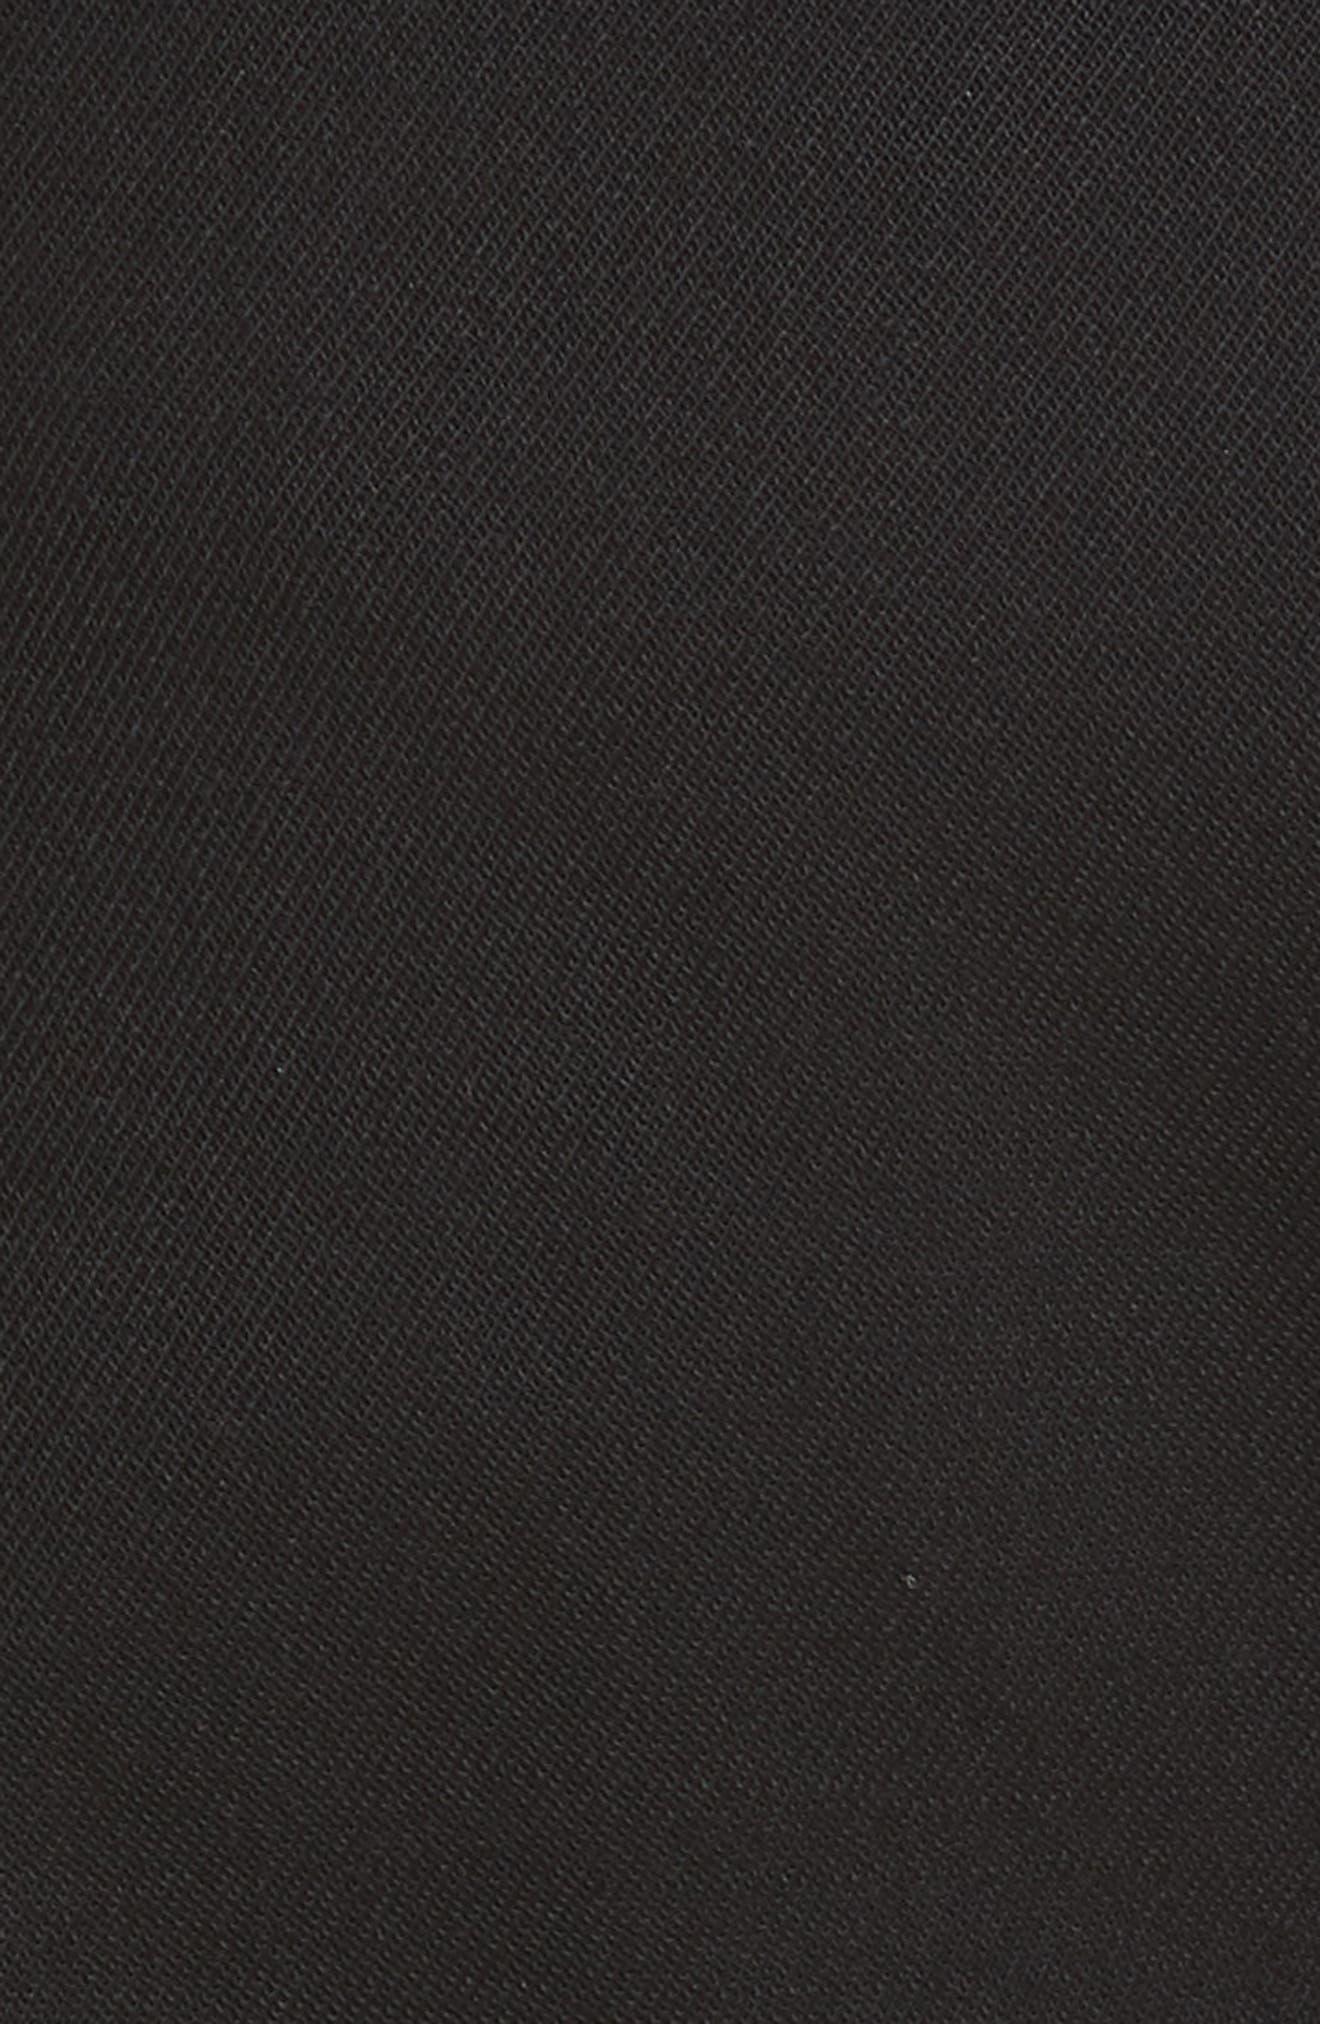 Side Zip Detail Suiting Pants,                             Alternate thumbnail 5, color,                             Black